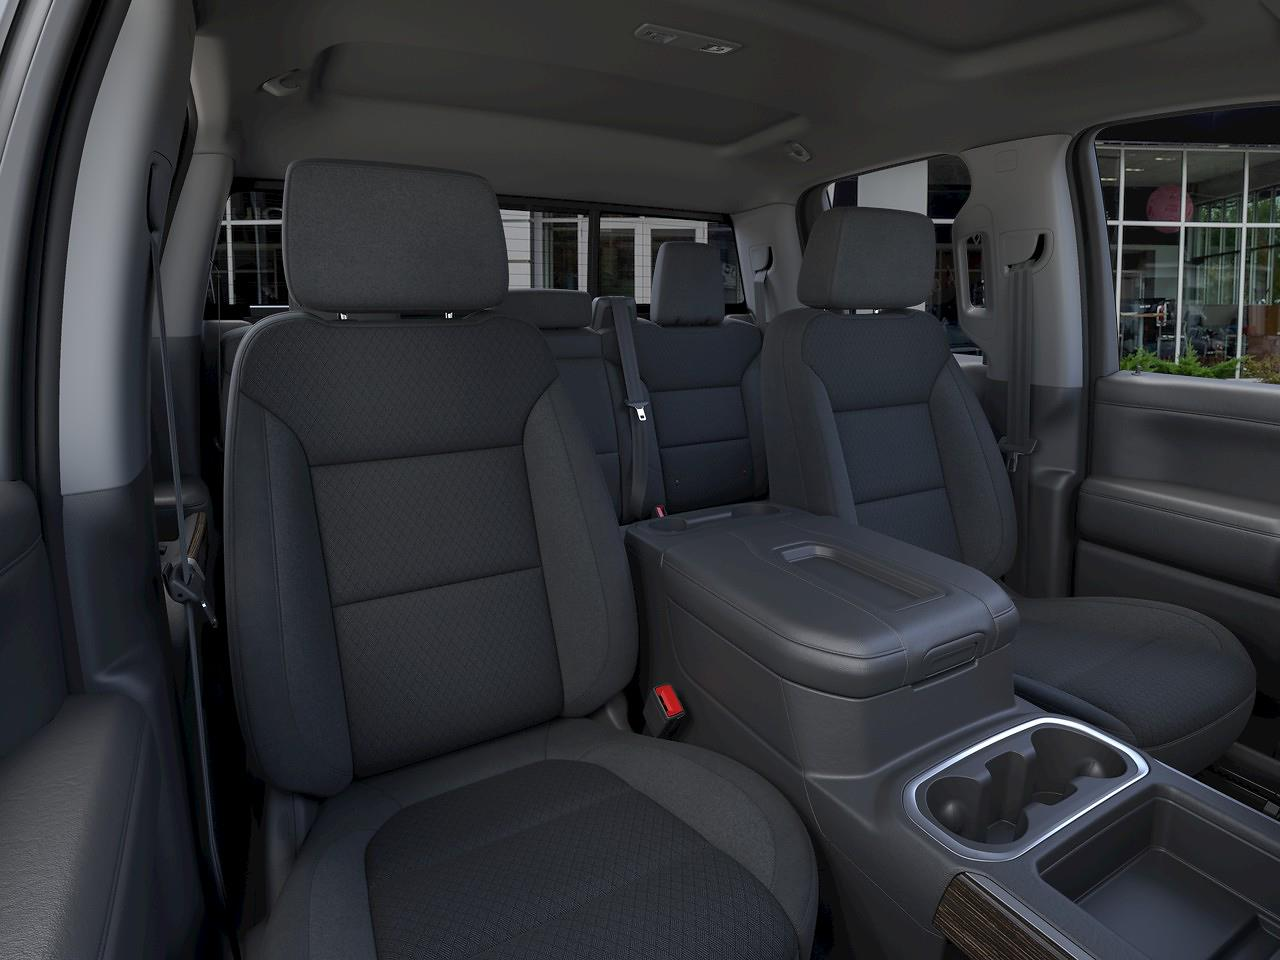 2021 GMC Sierra 1500 Double Cab 4x4, Pickup #243372 - photo 13